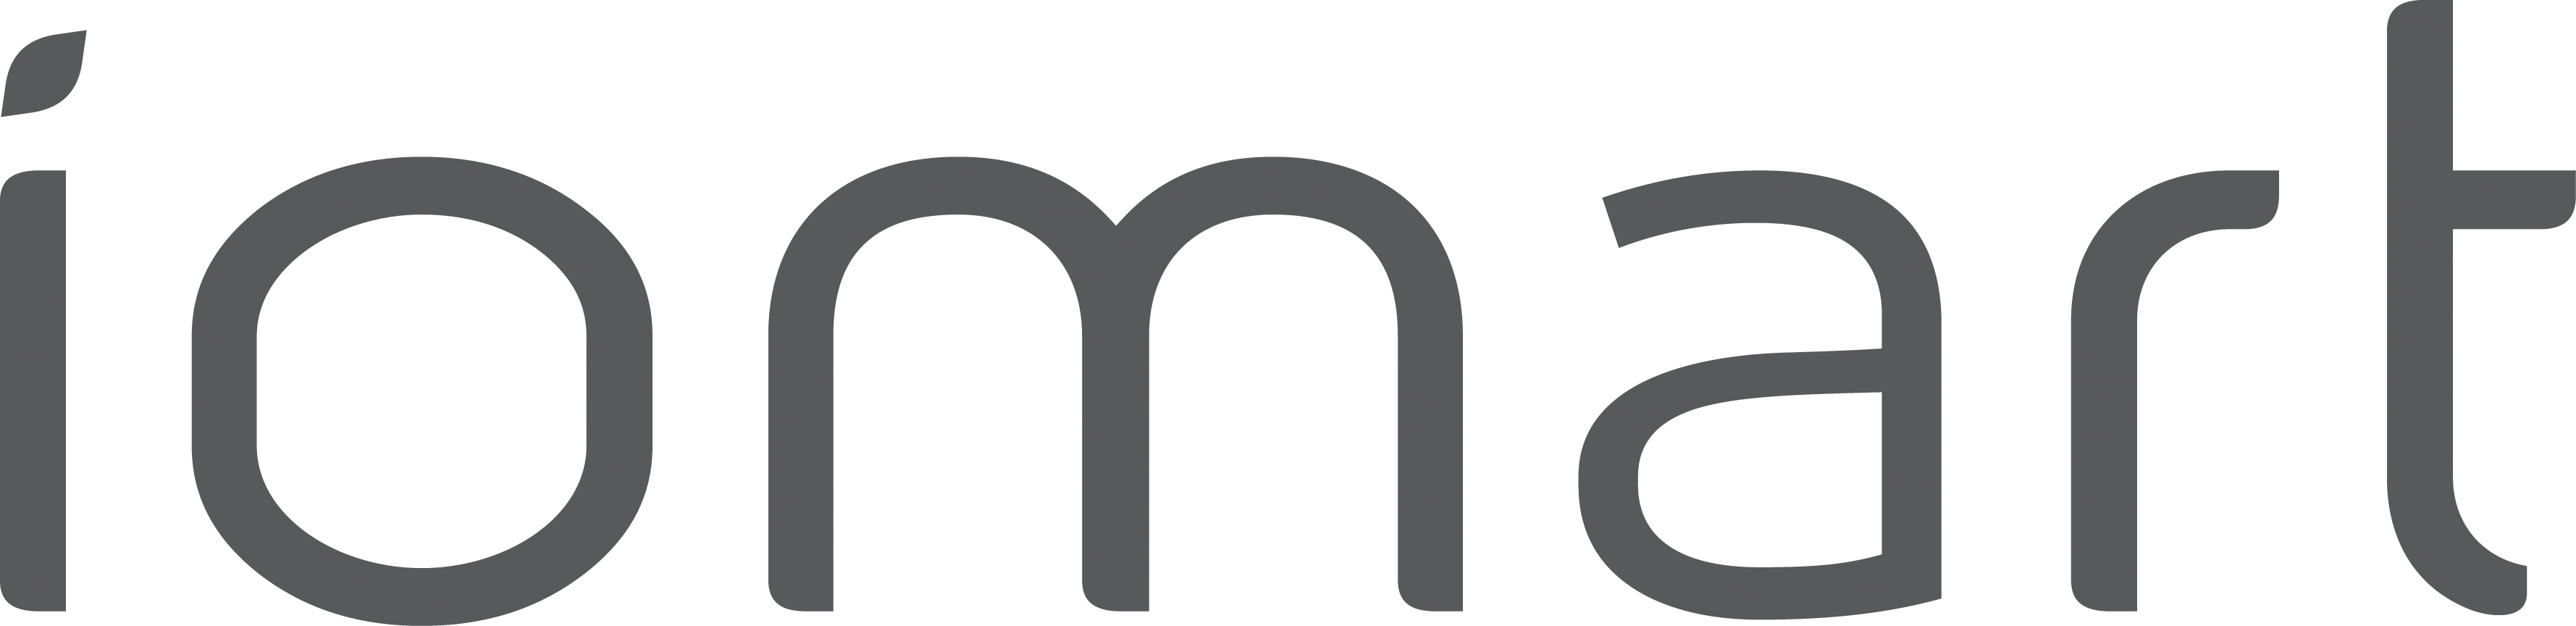 Iomart Group Plc logo